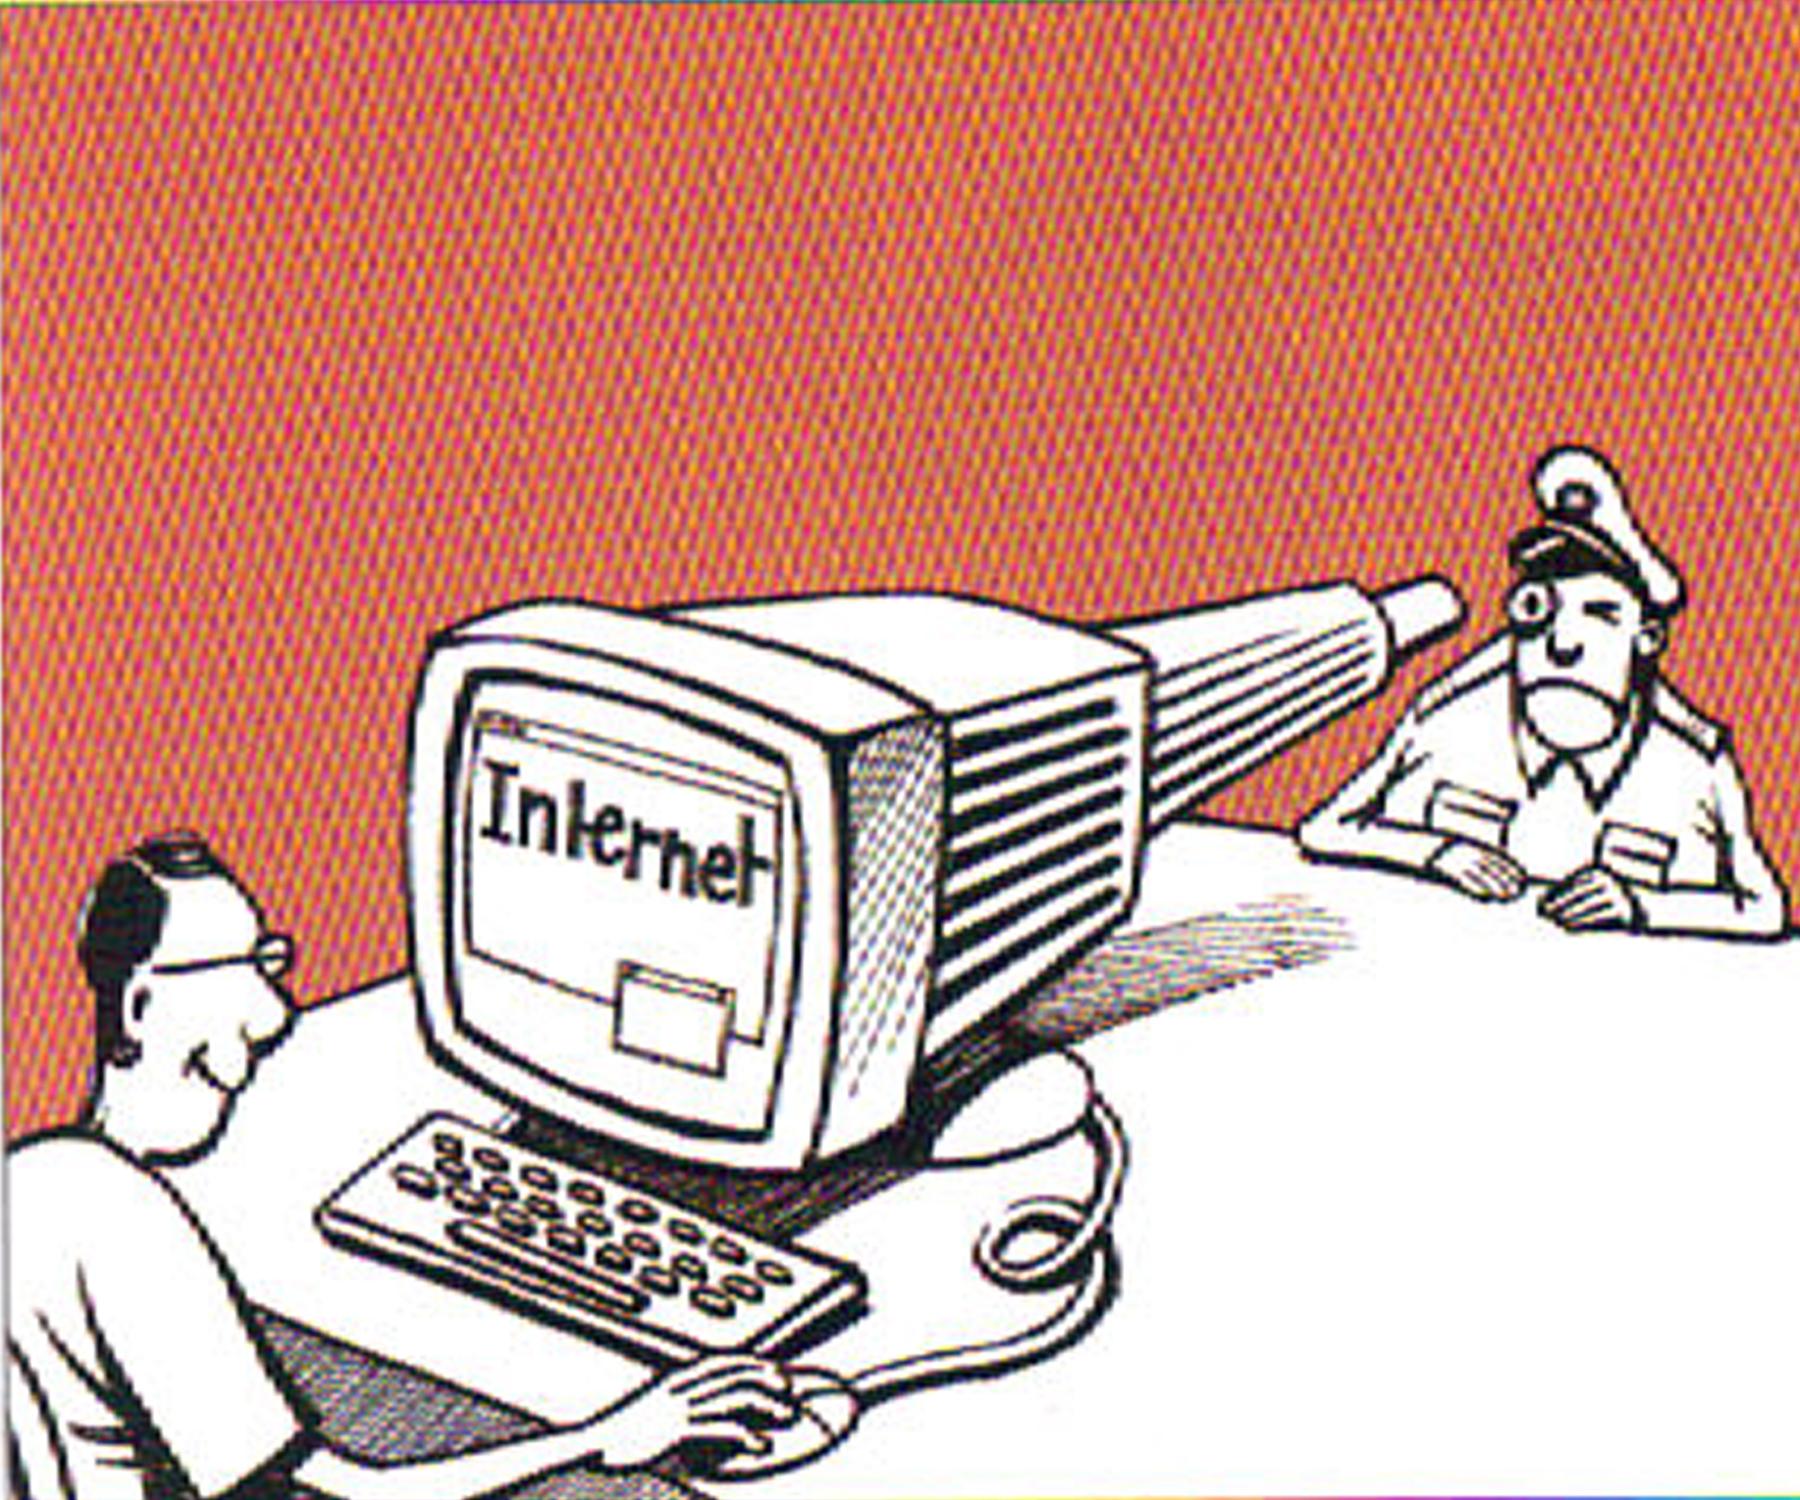 BA 225 - Libertad Internet